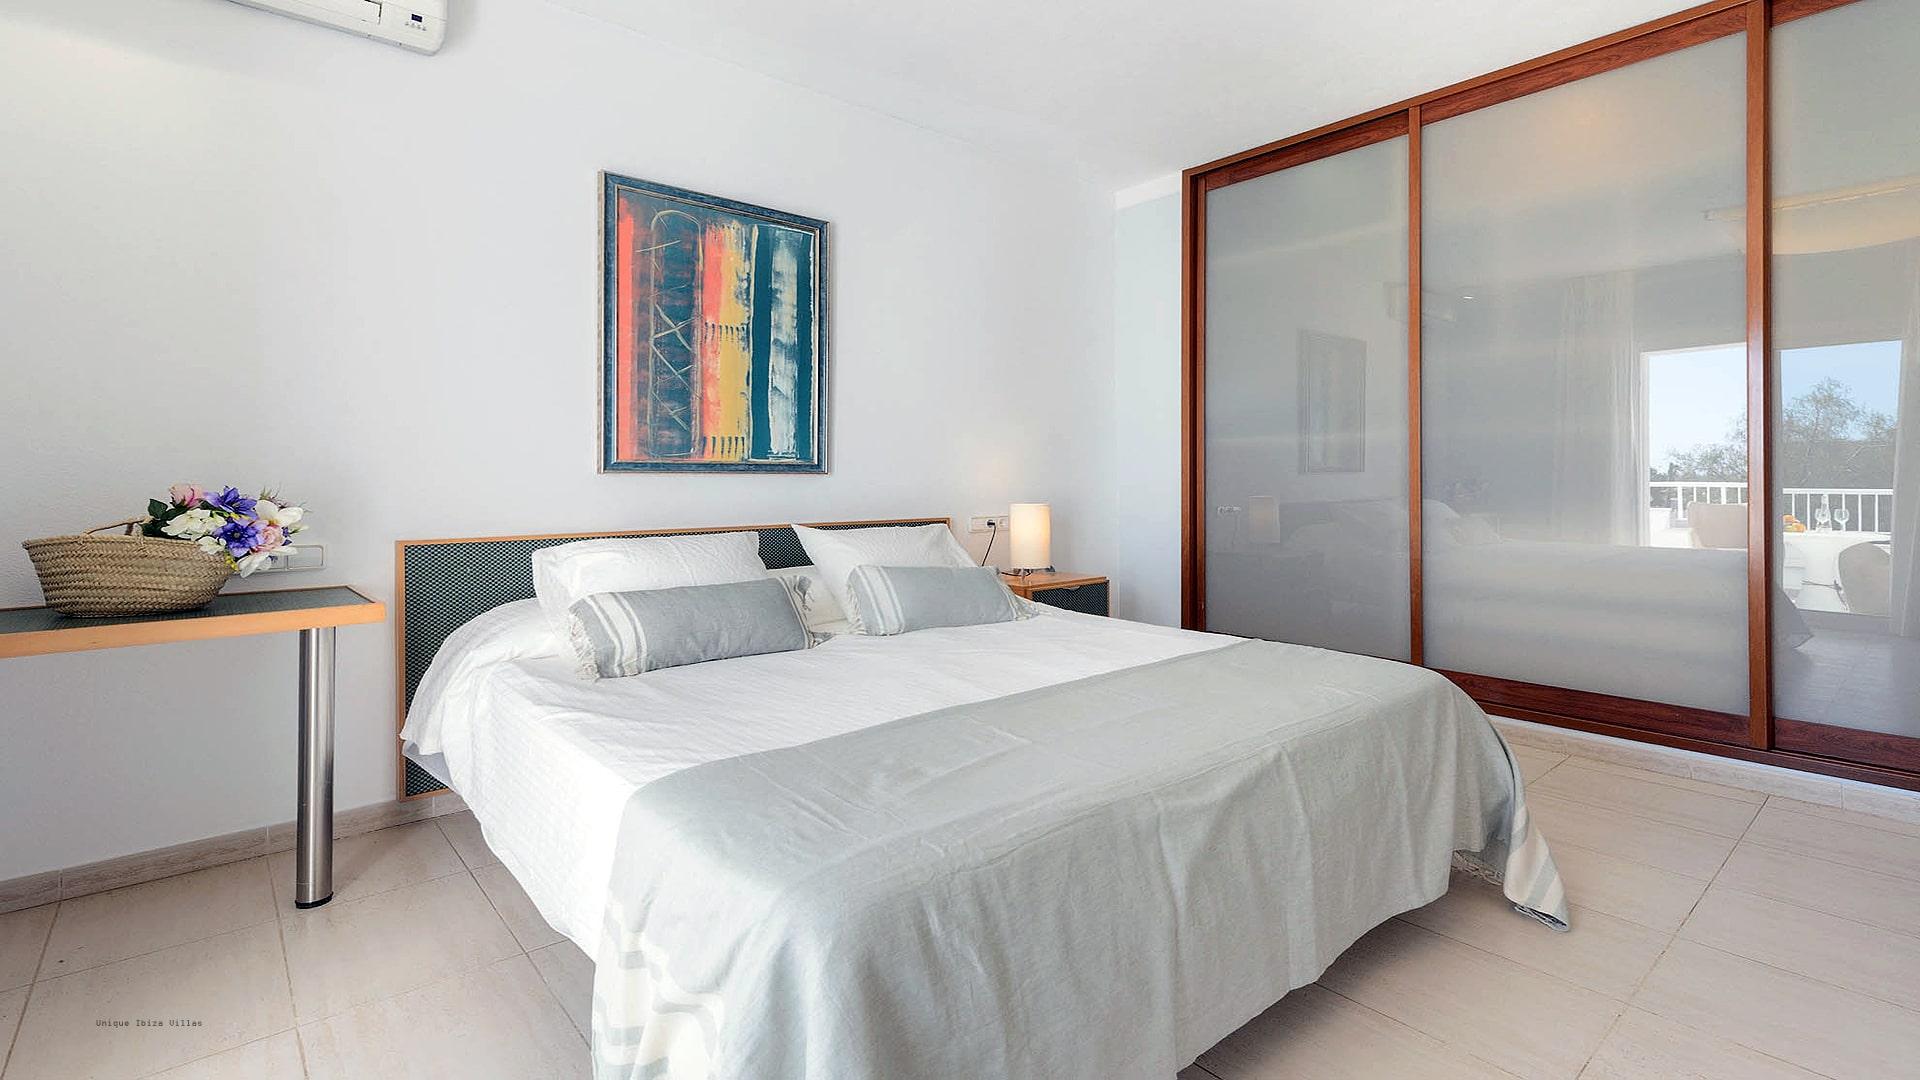 Villa Can Fluxa Ibiza 37 Bedroom 2